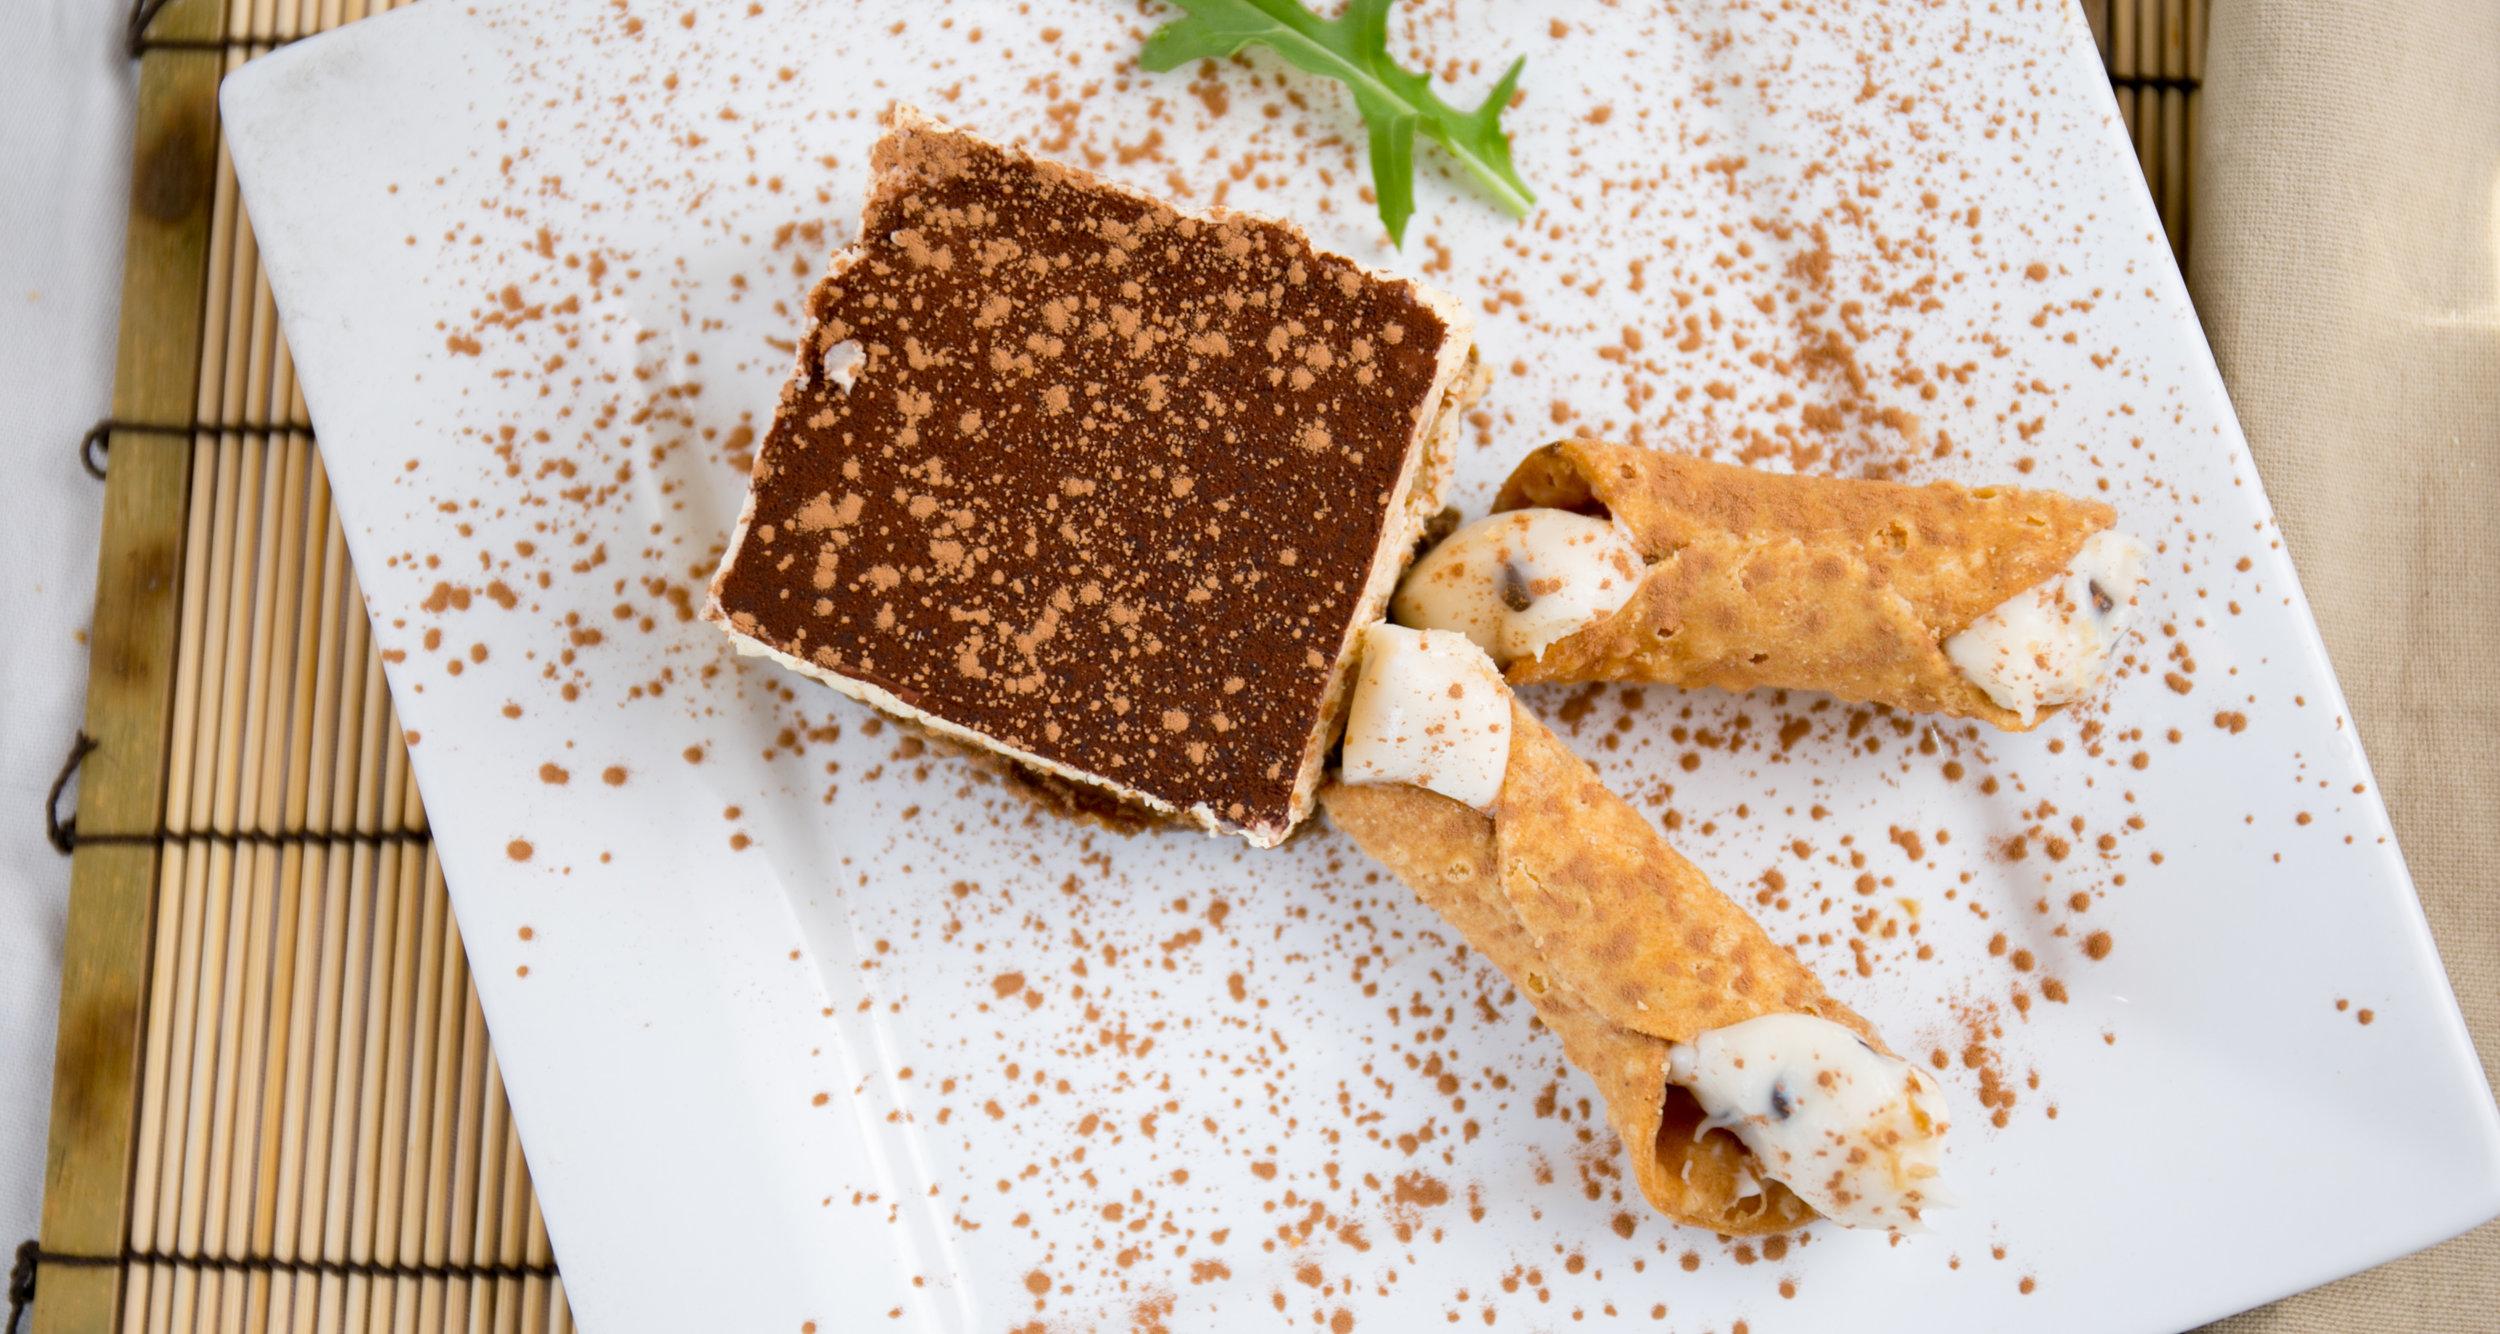 Alfredos_Desserts_01.jpg